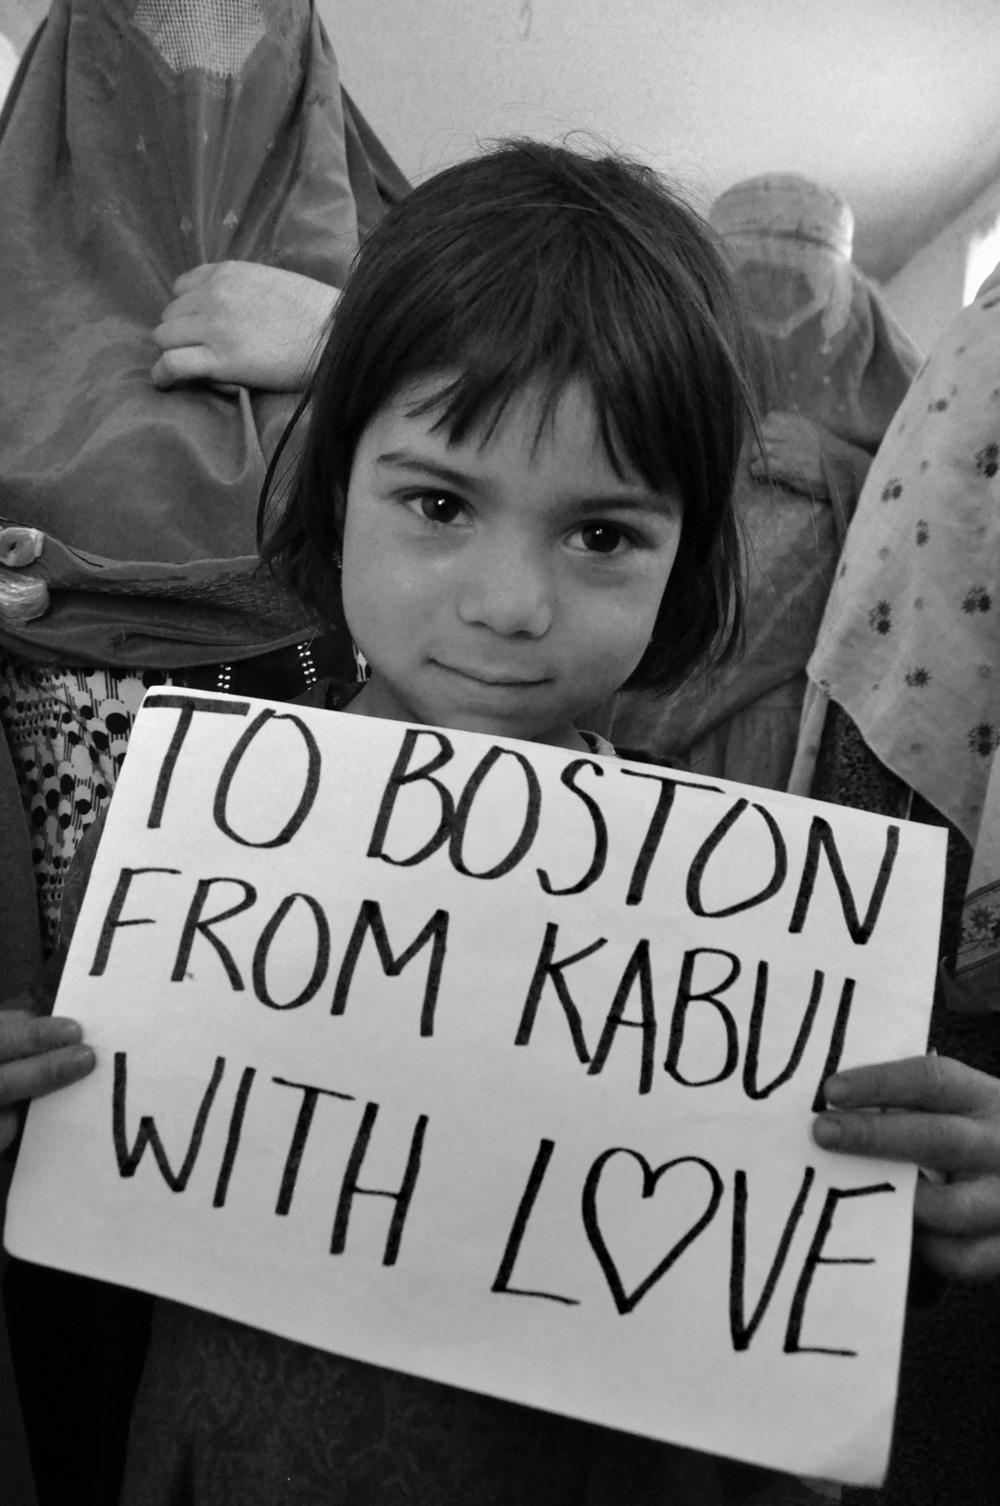 BostonKabulLoveSmall15